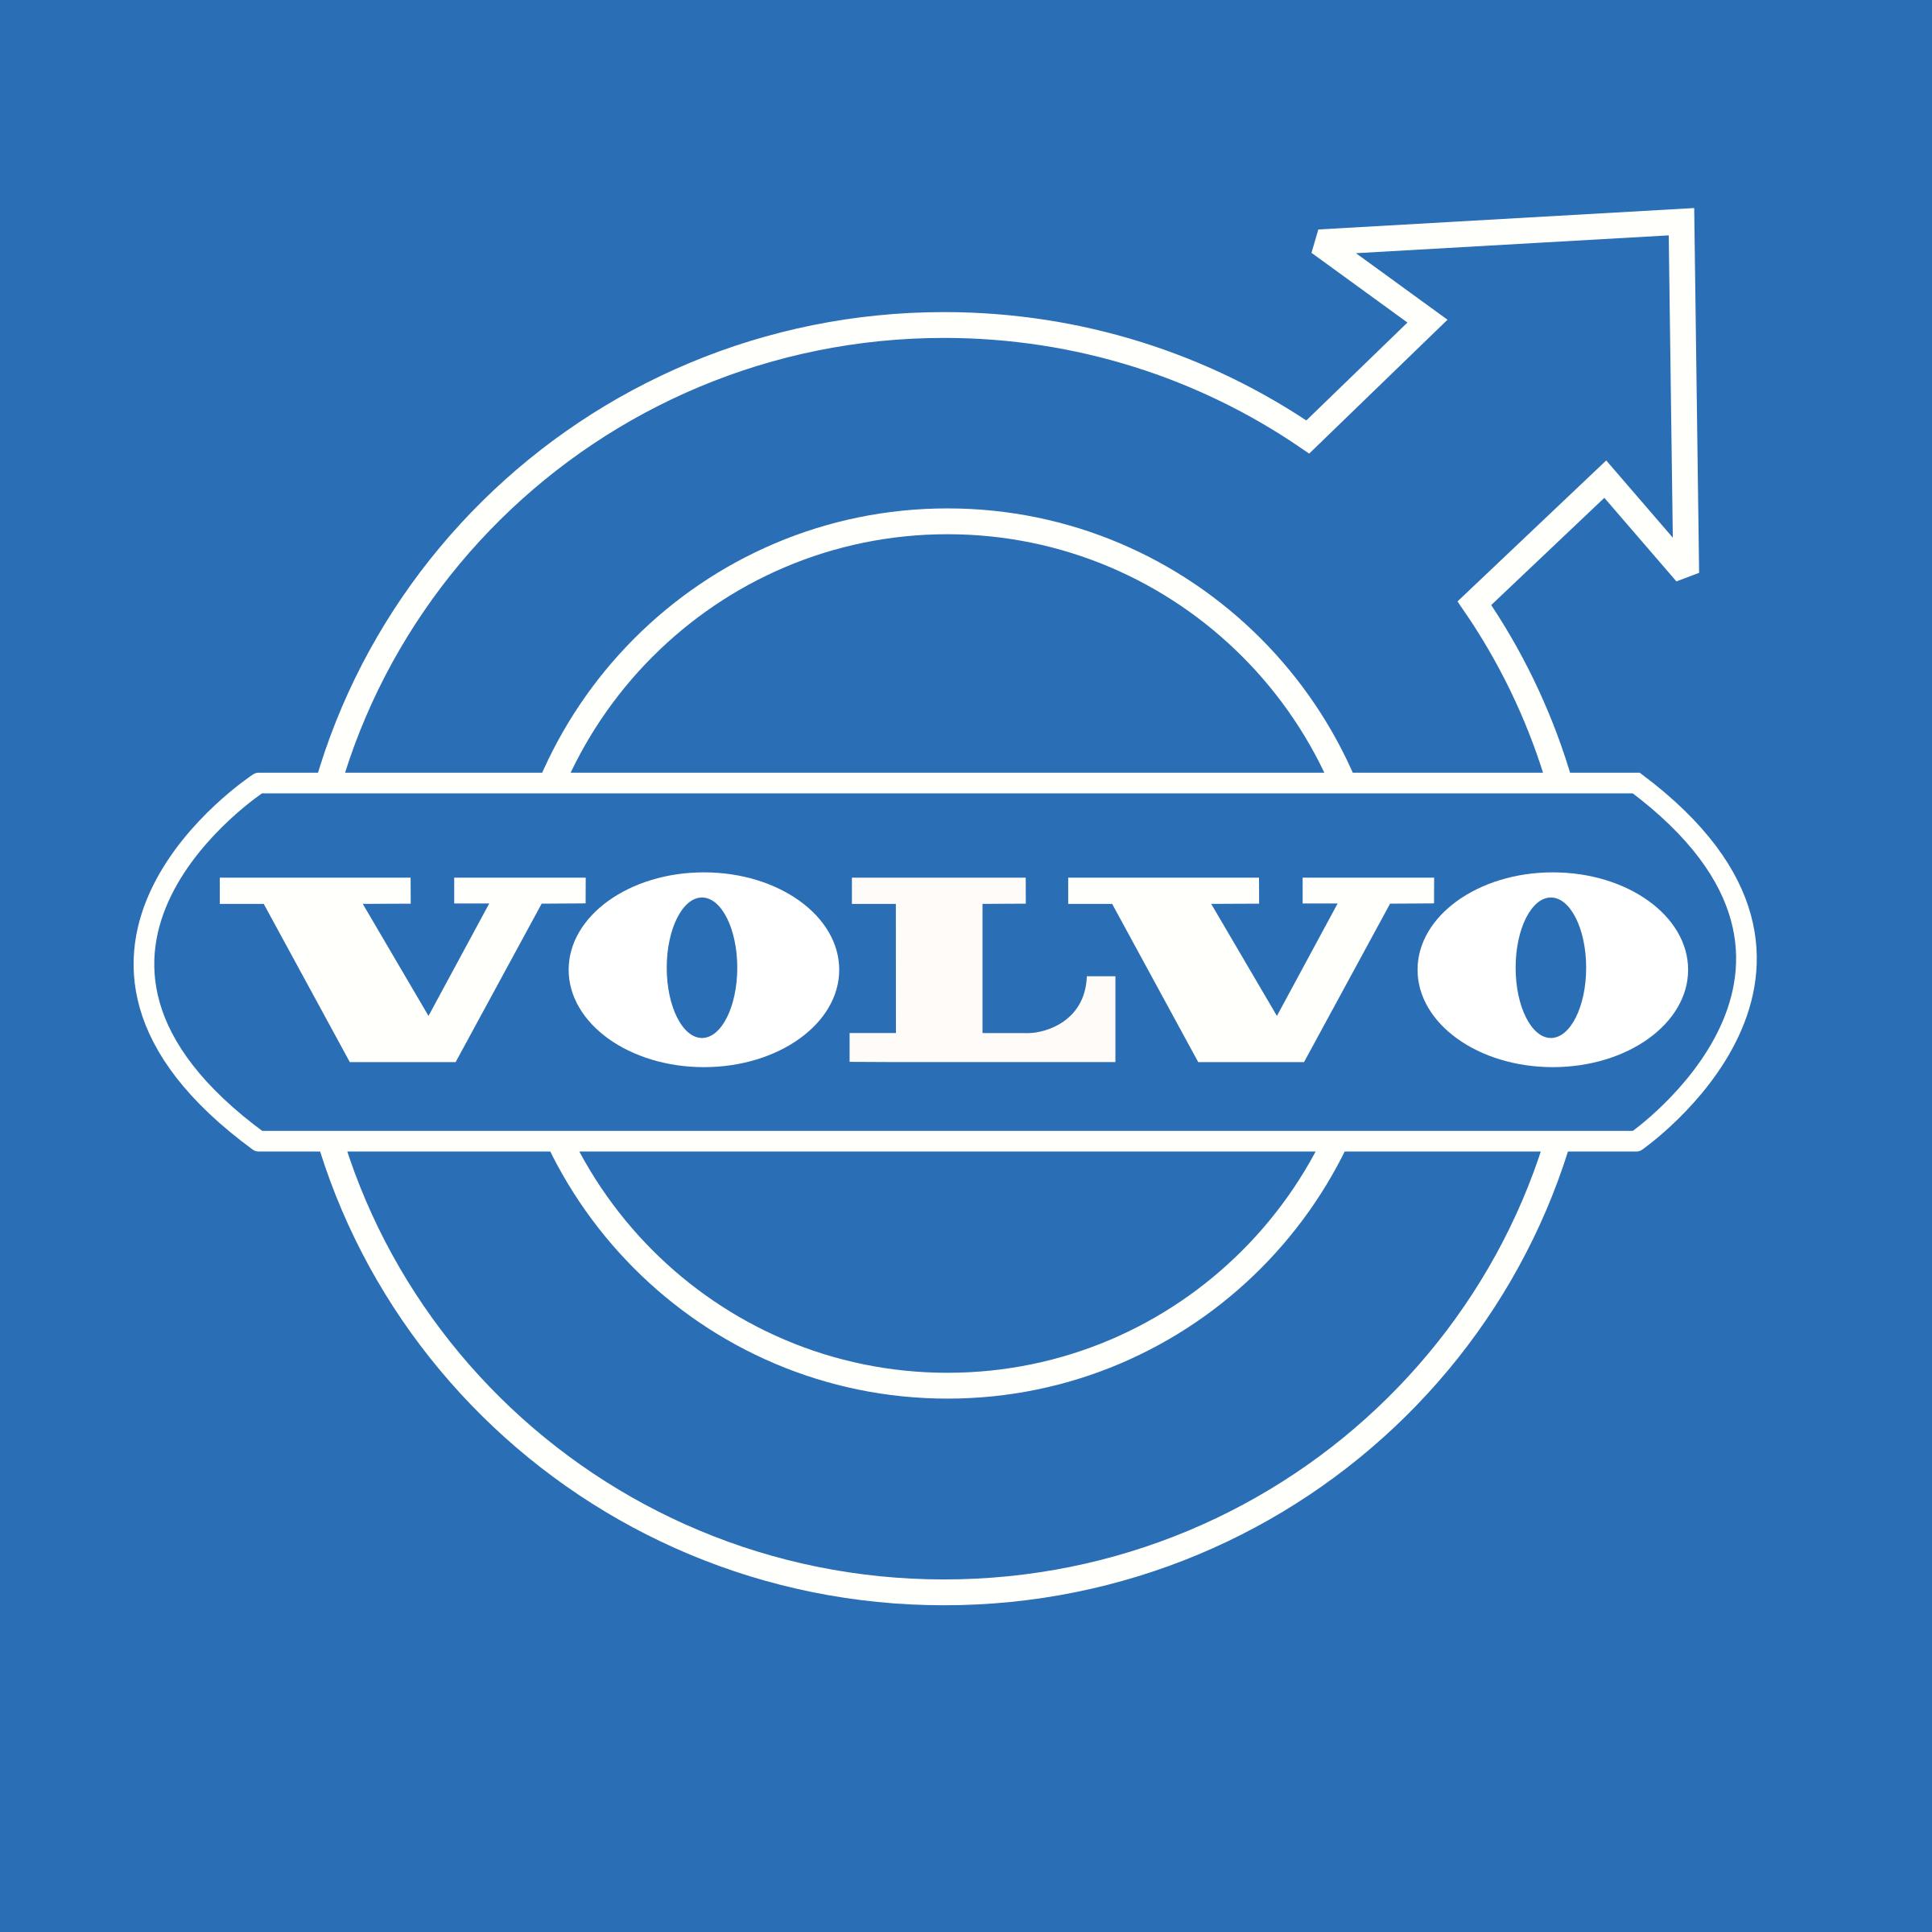 Volvo Logo PNG Transparent & SVG Vector - Freebie Supply